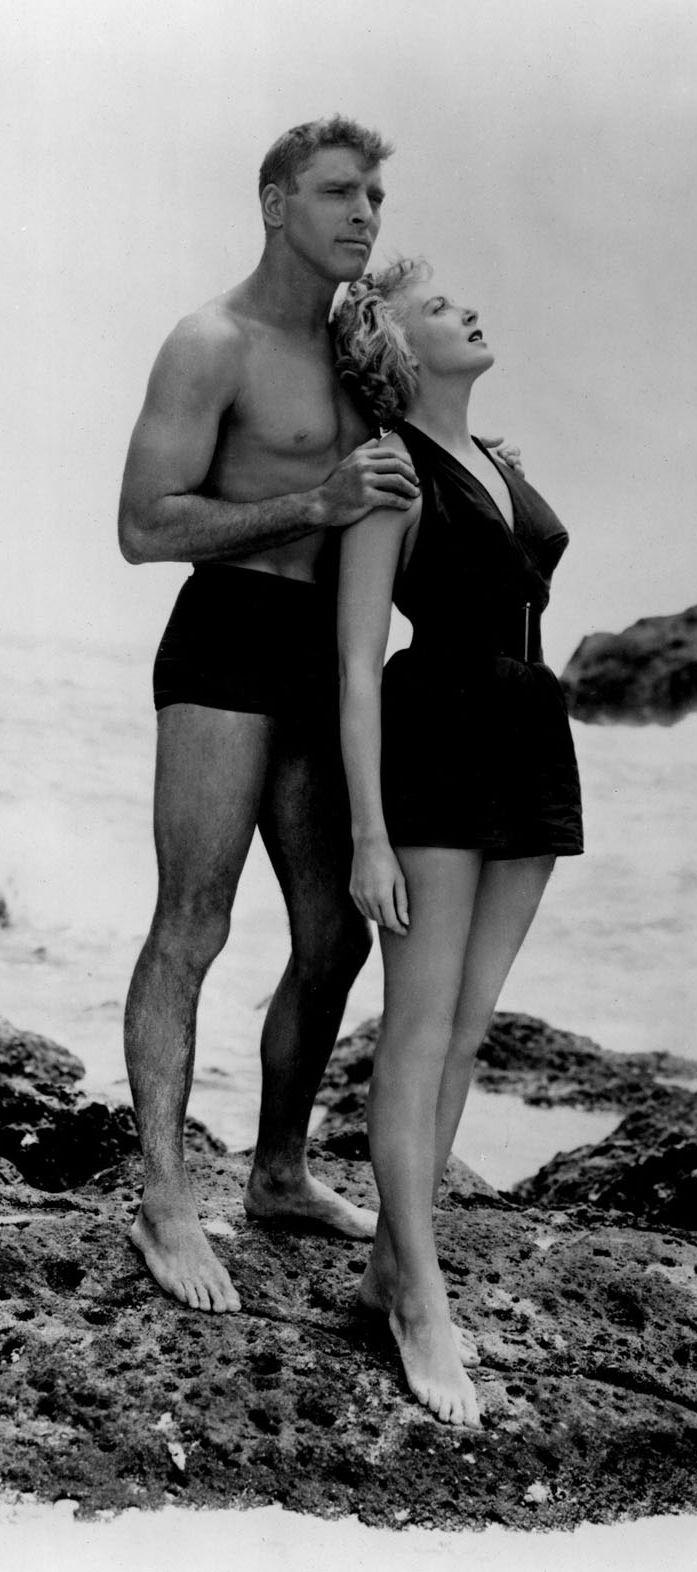 Anna Maria Pierangeli (1932?971),Denise Laurel (b. 1987) Hot pics & movies Paraluman (1923?009),Lisa Freeman